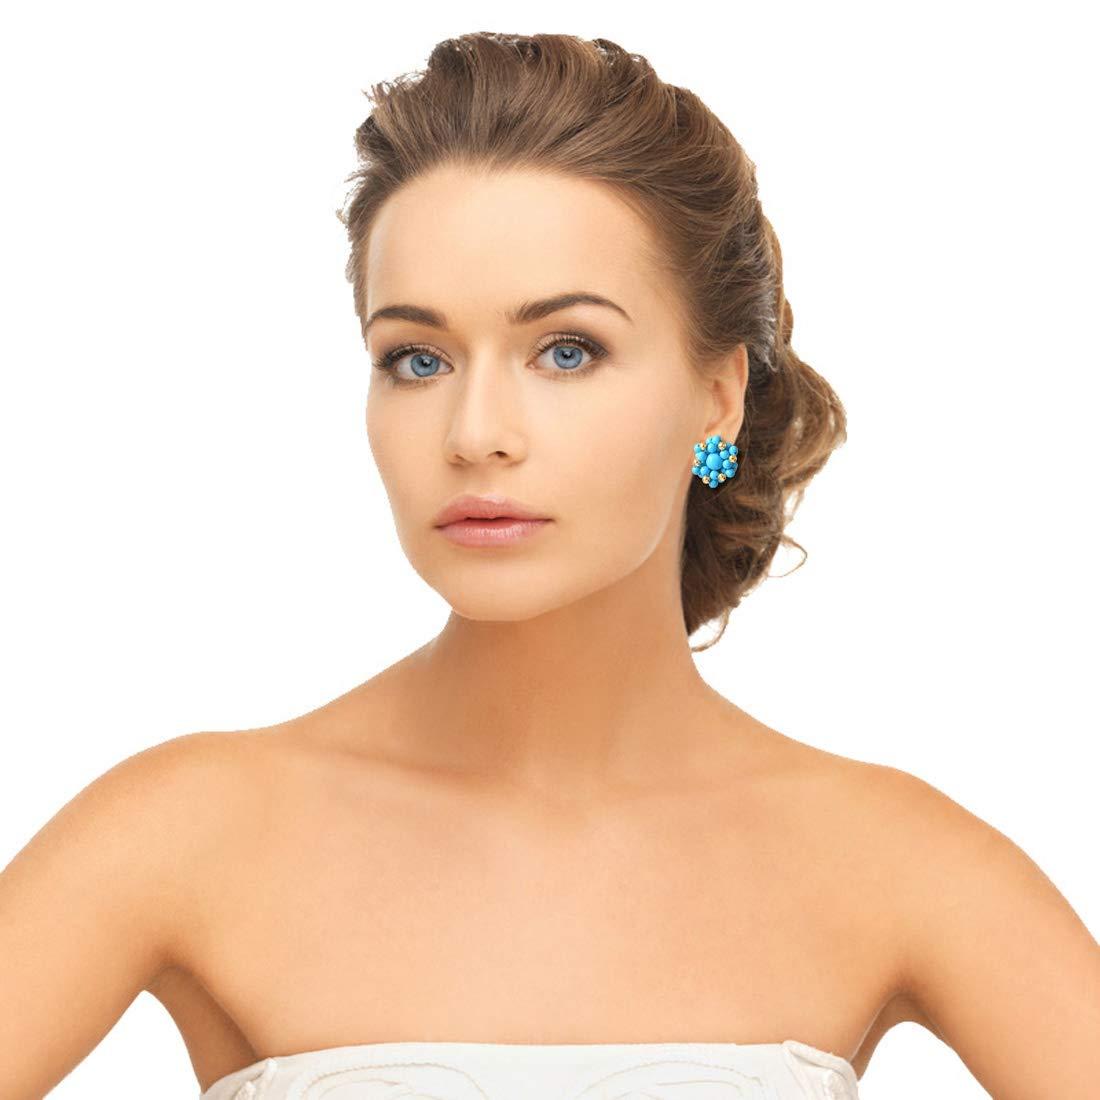 Love Blue Beads - Real Turquoise Beads Kuda Jodi Earrings for Women (SE20)